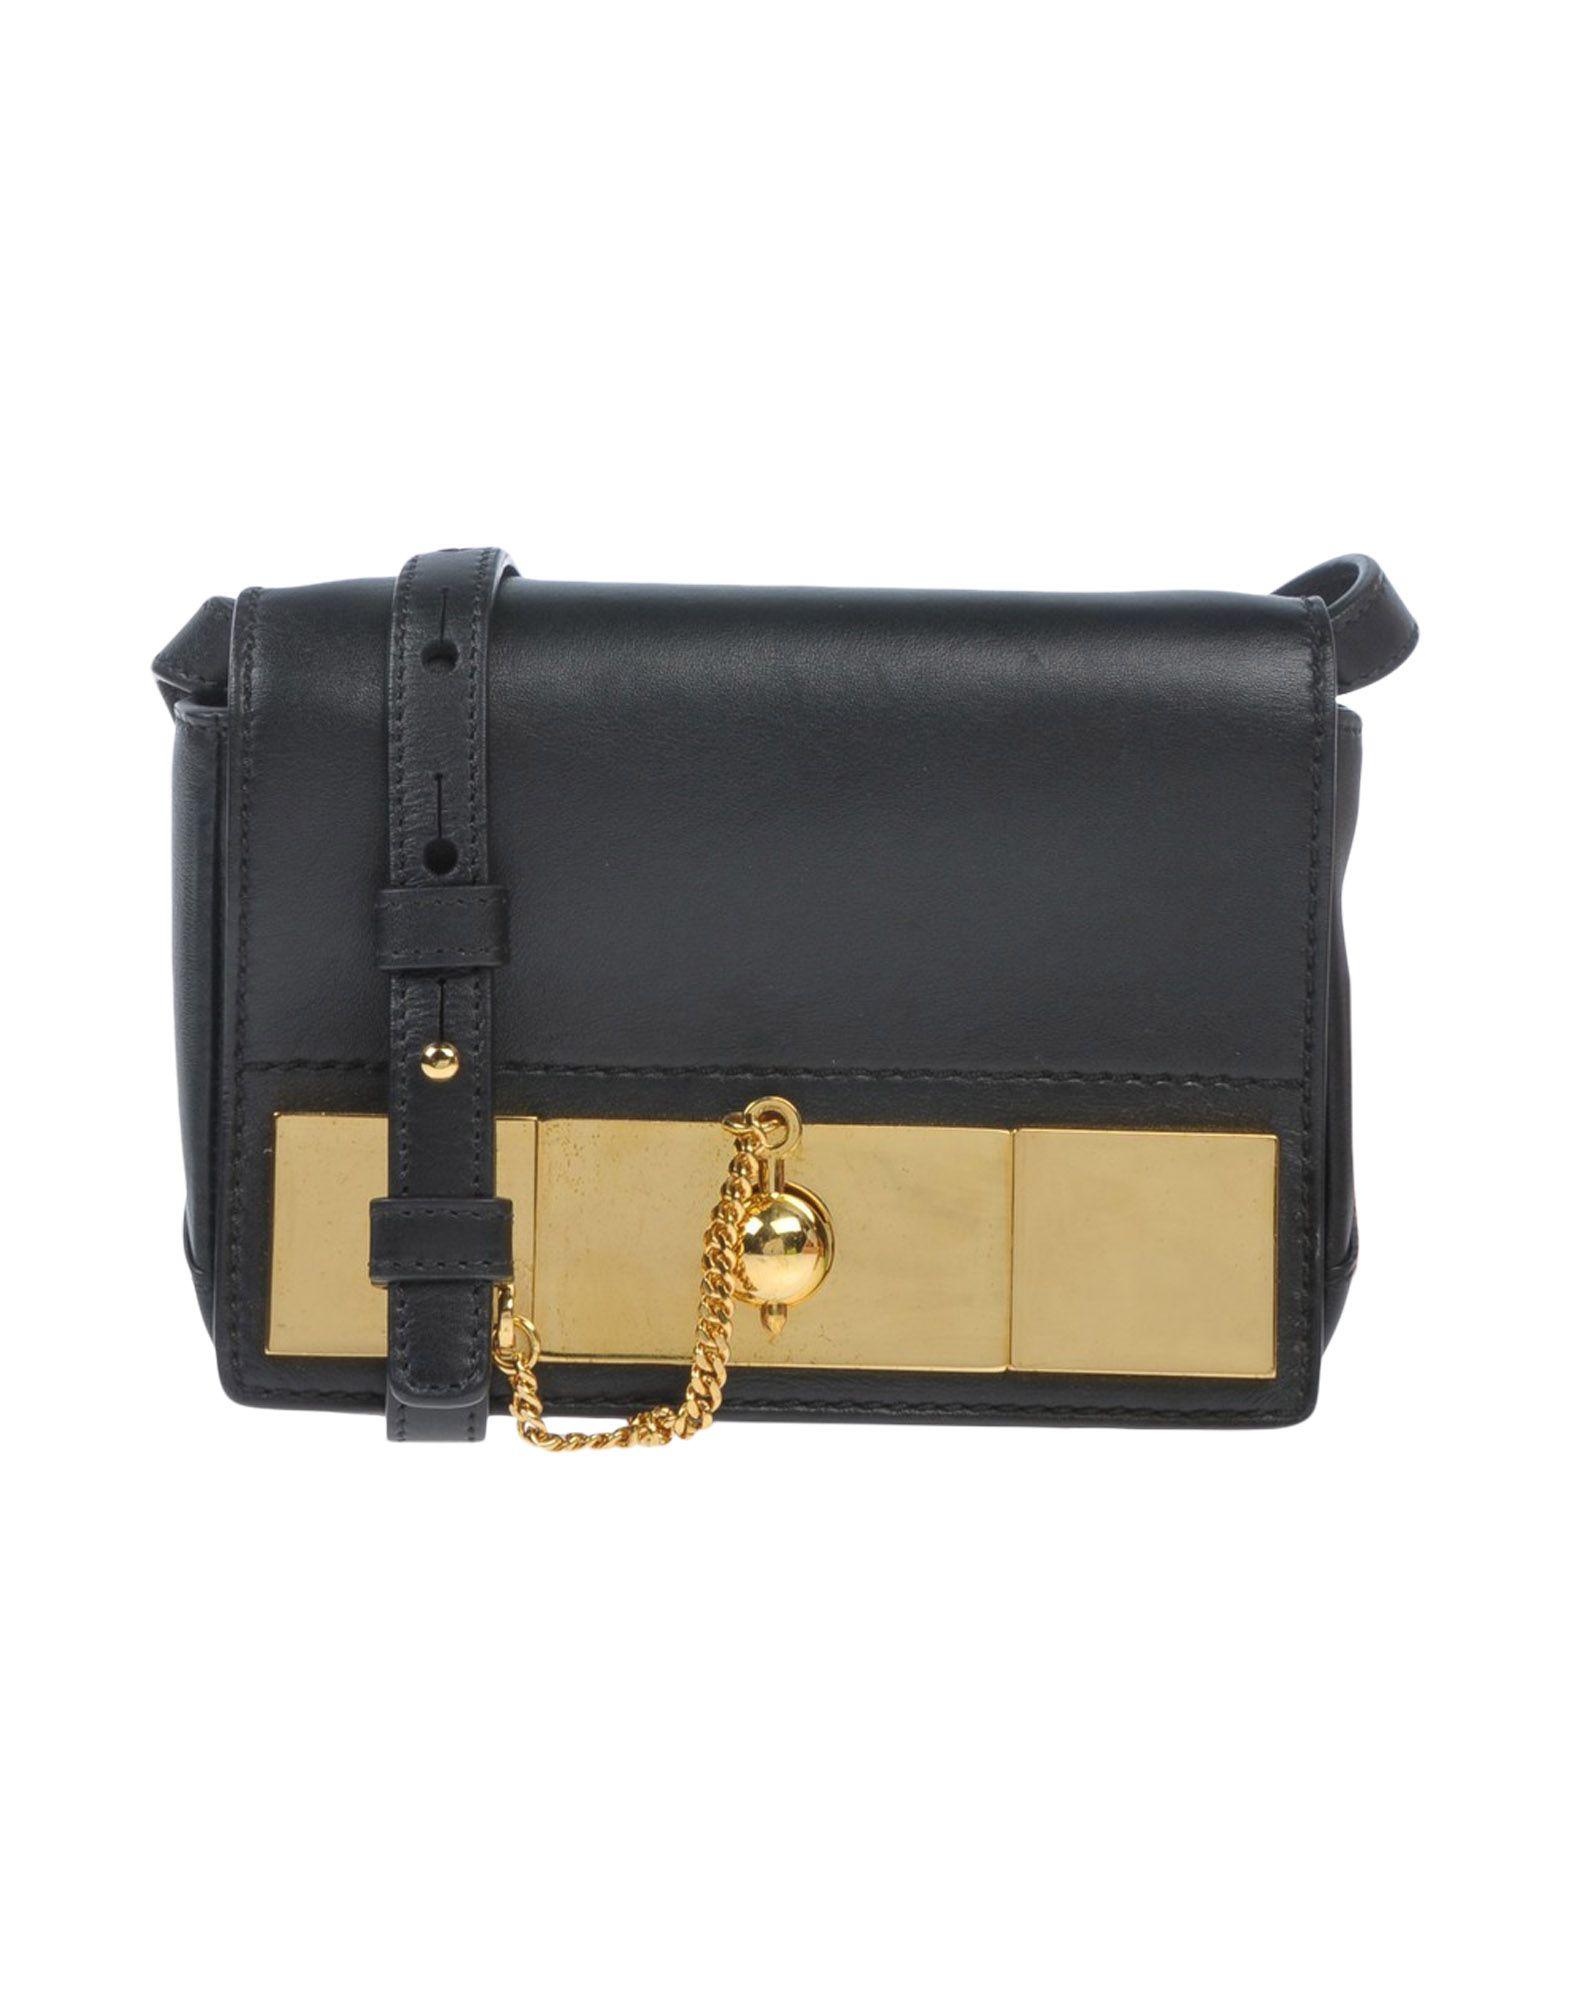 ANTHONY VACCARELLO Handbag in Black